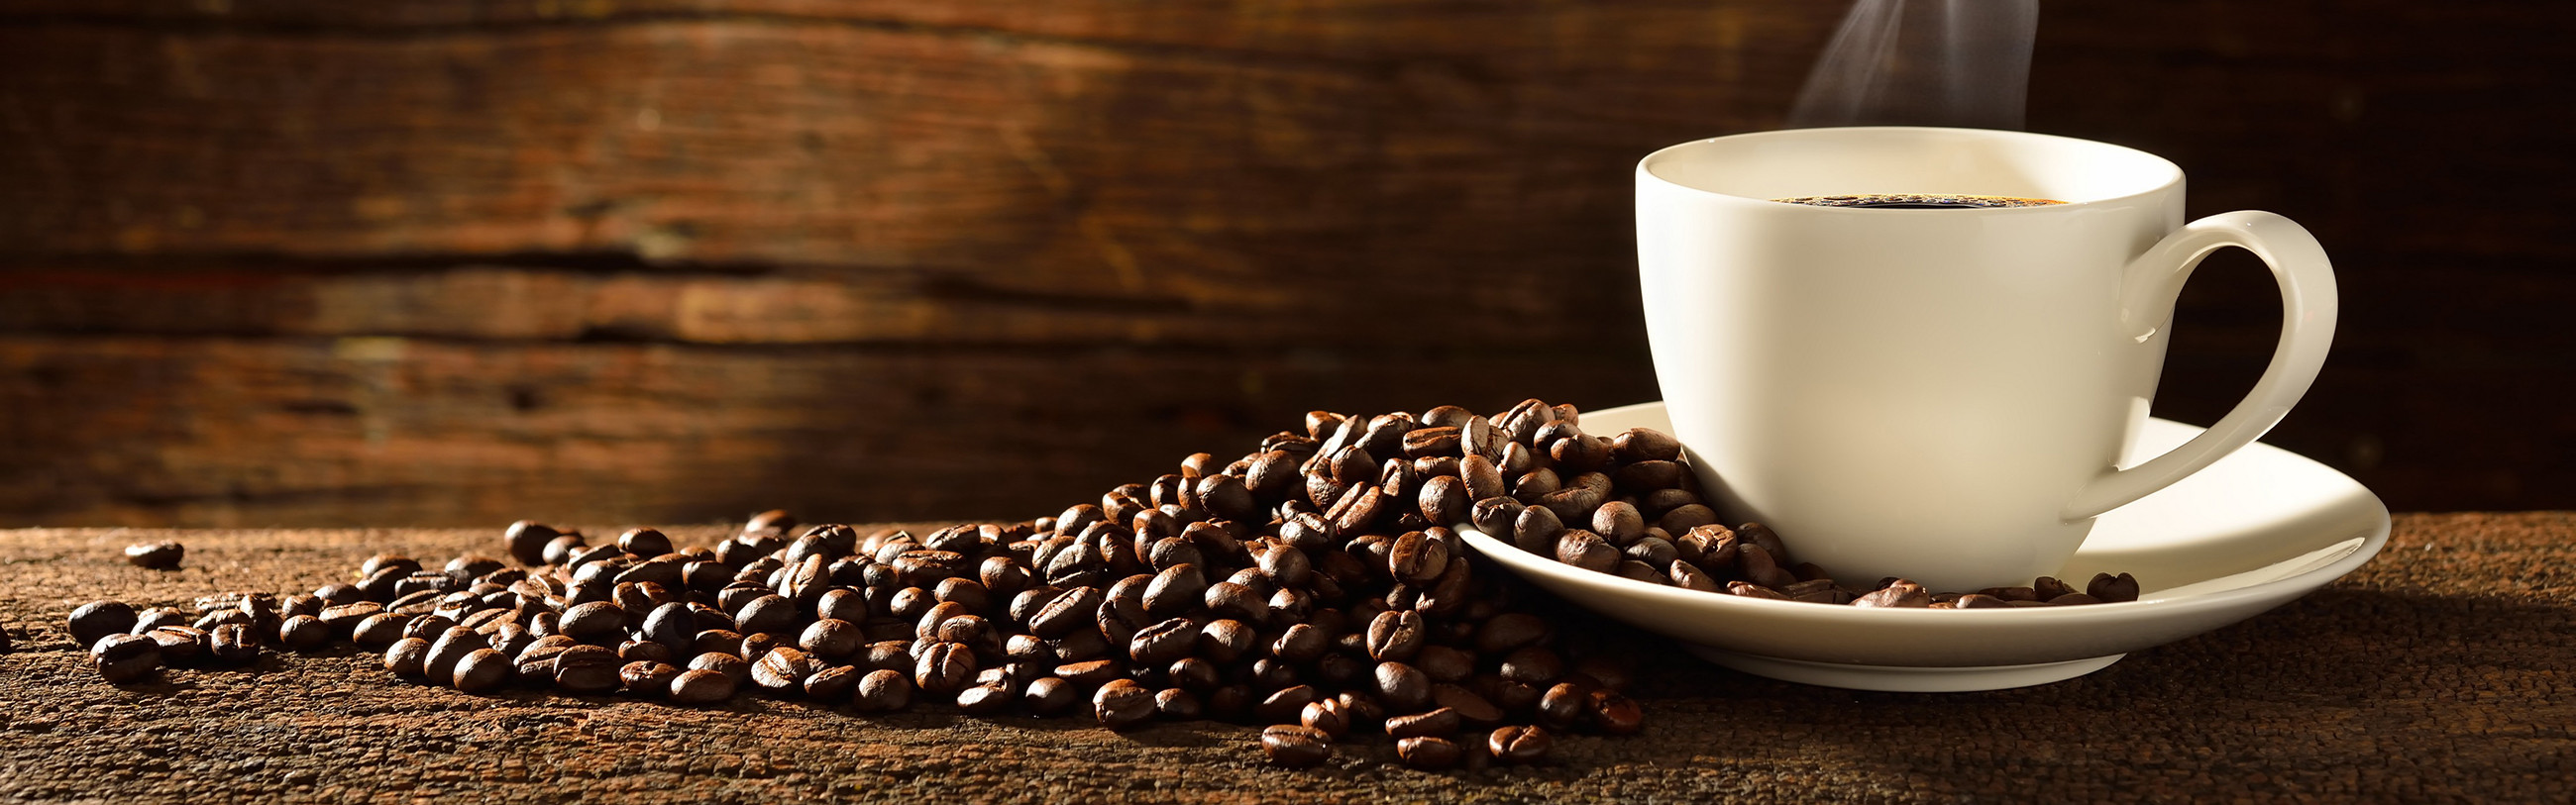 COFFEEDREAM, to je káva s láskou a vášní